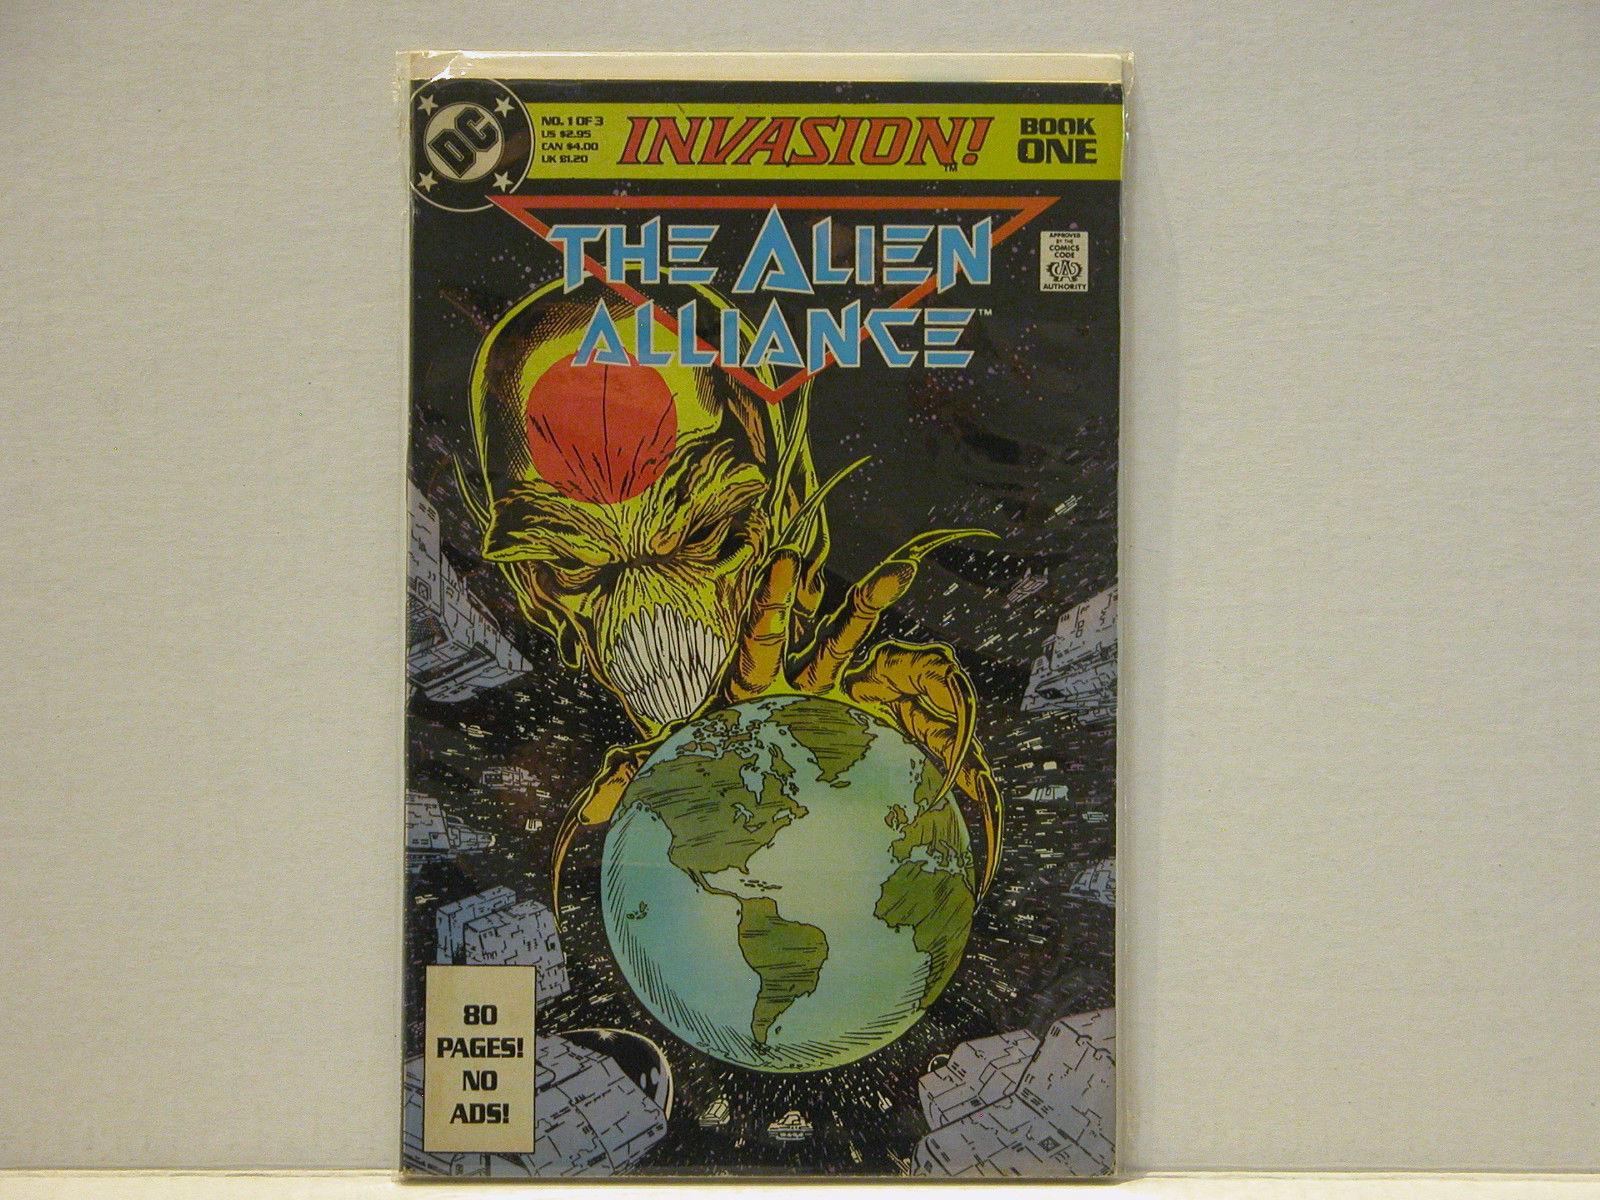 INVASION #1 - DC COMICS EVENT - FREE SHIPPING